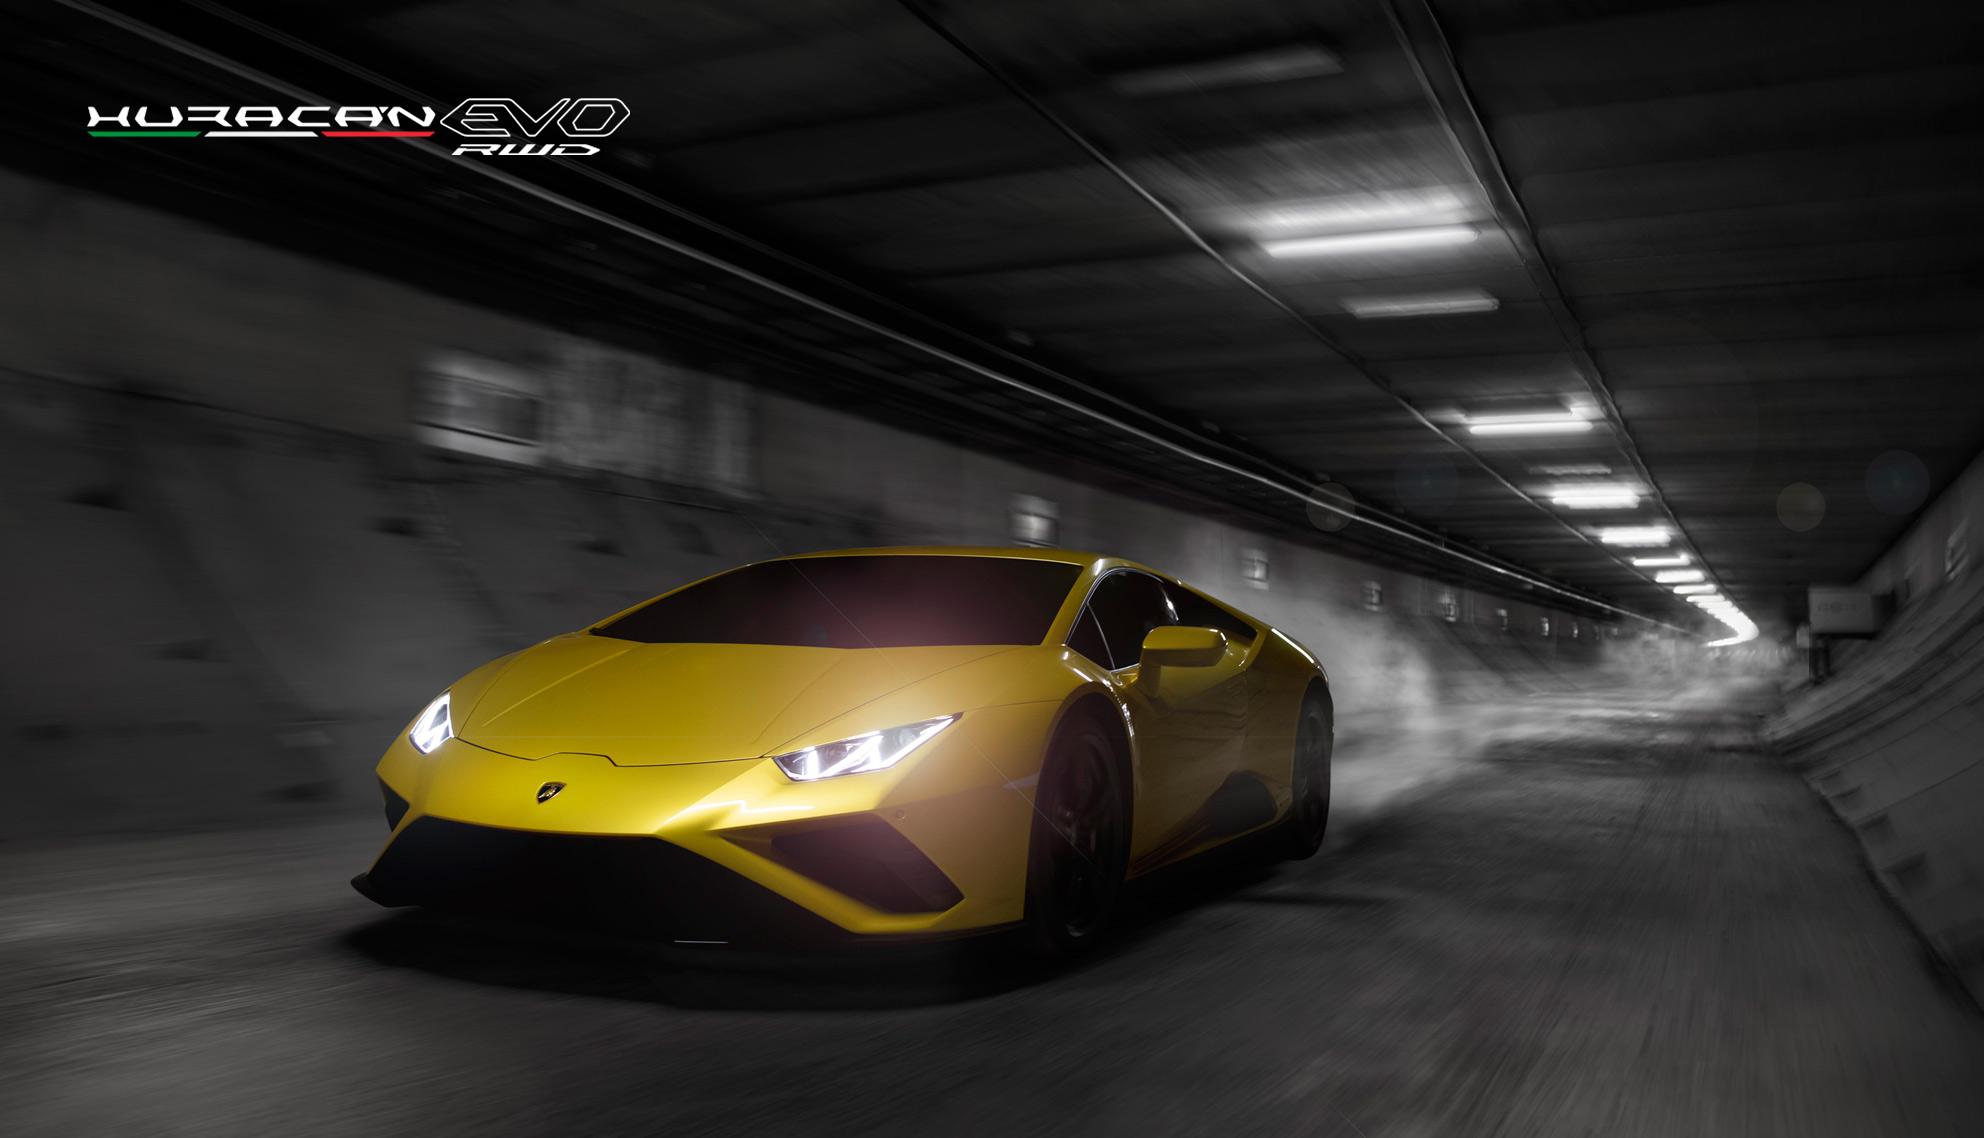 Vente privée lifestyle Lamborghini Genève